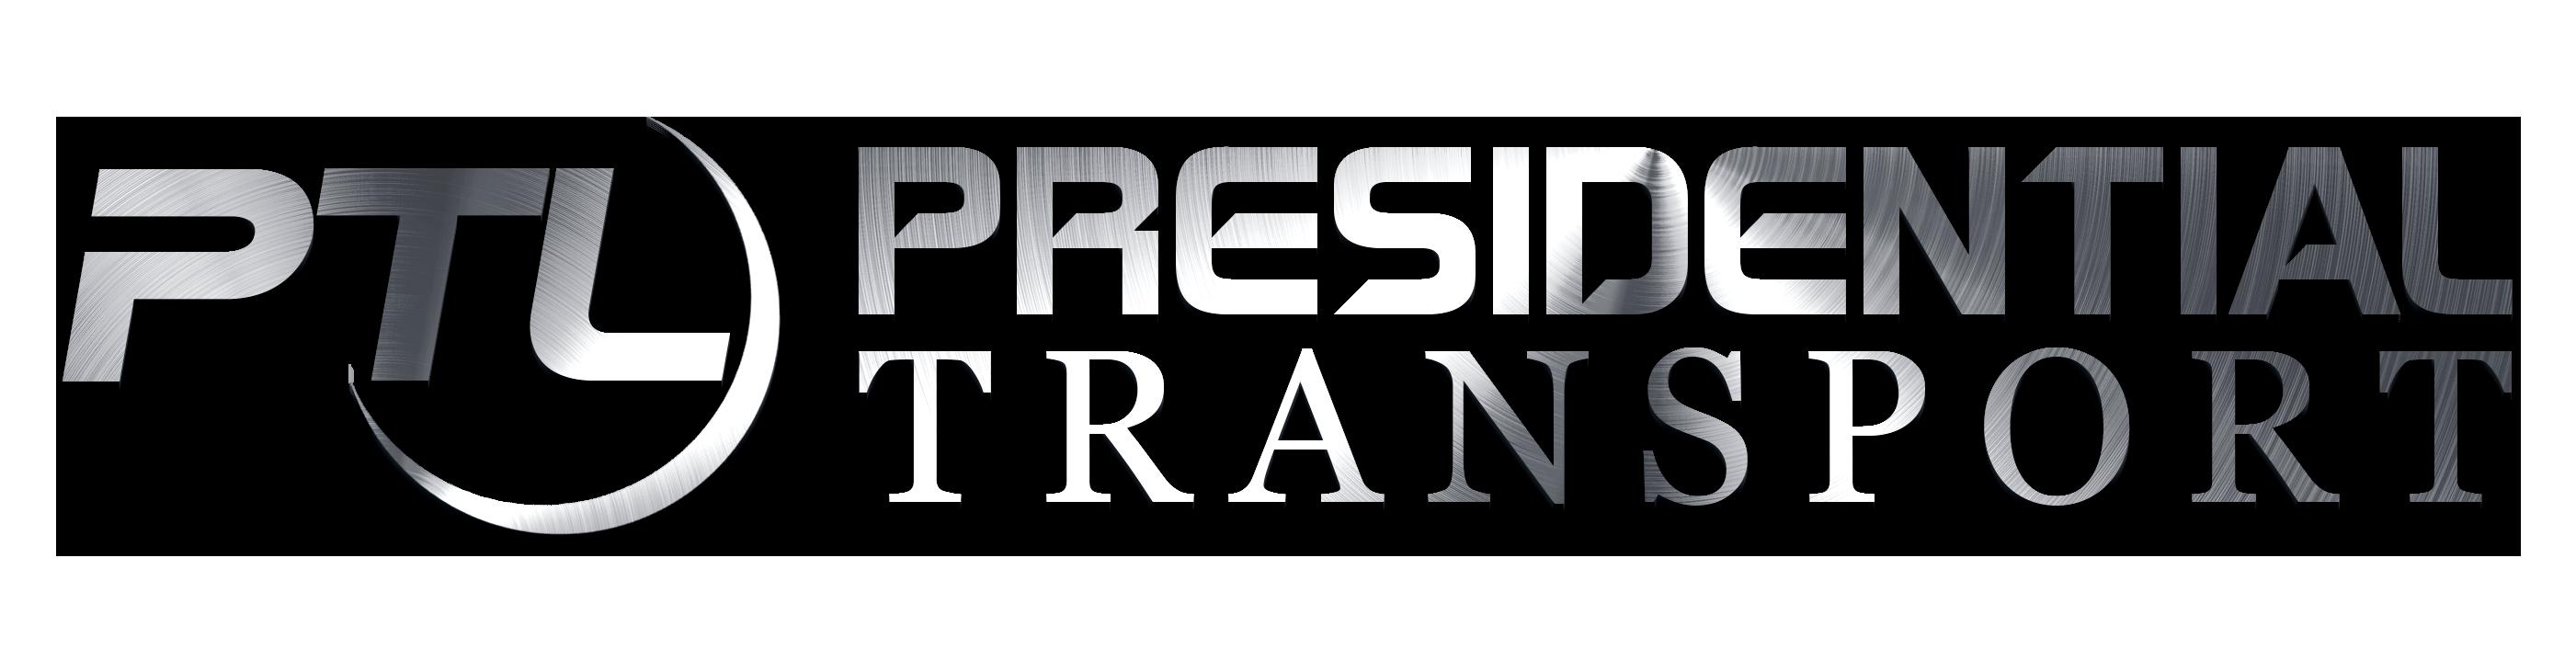 Presidential Transport